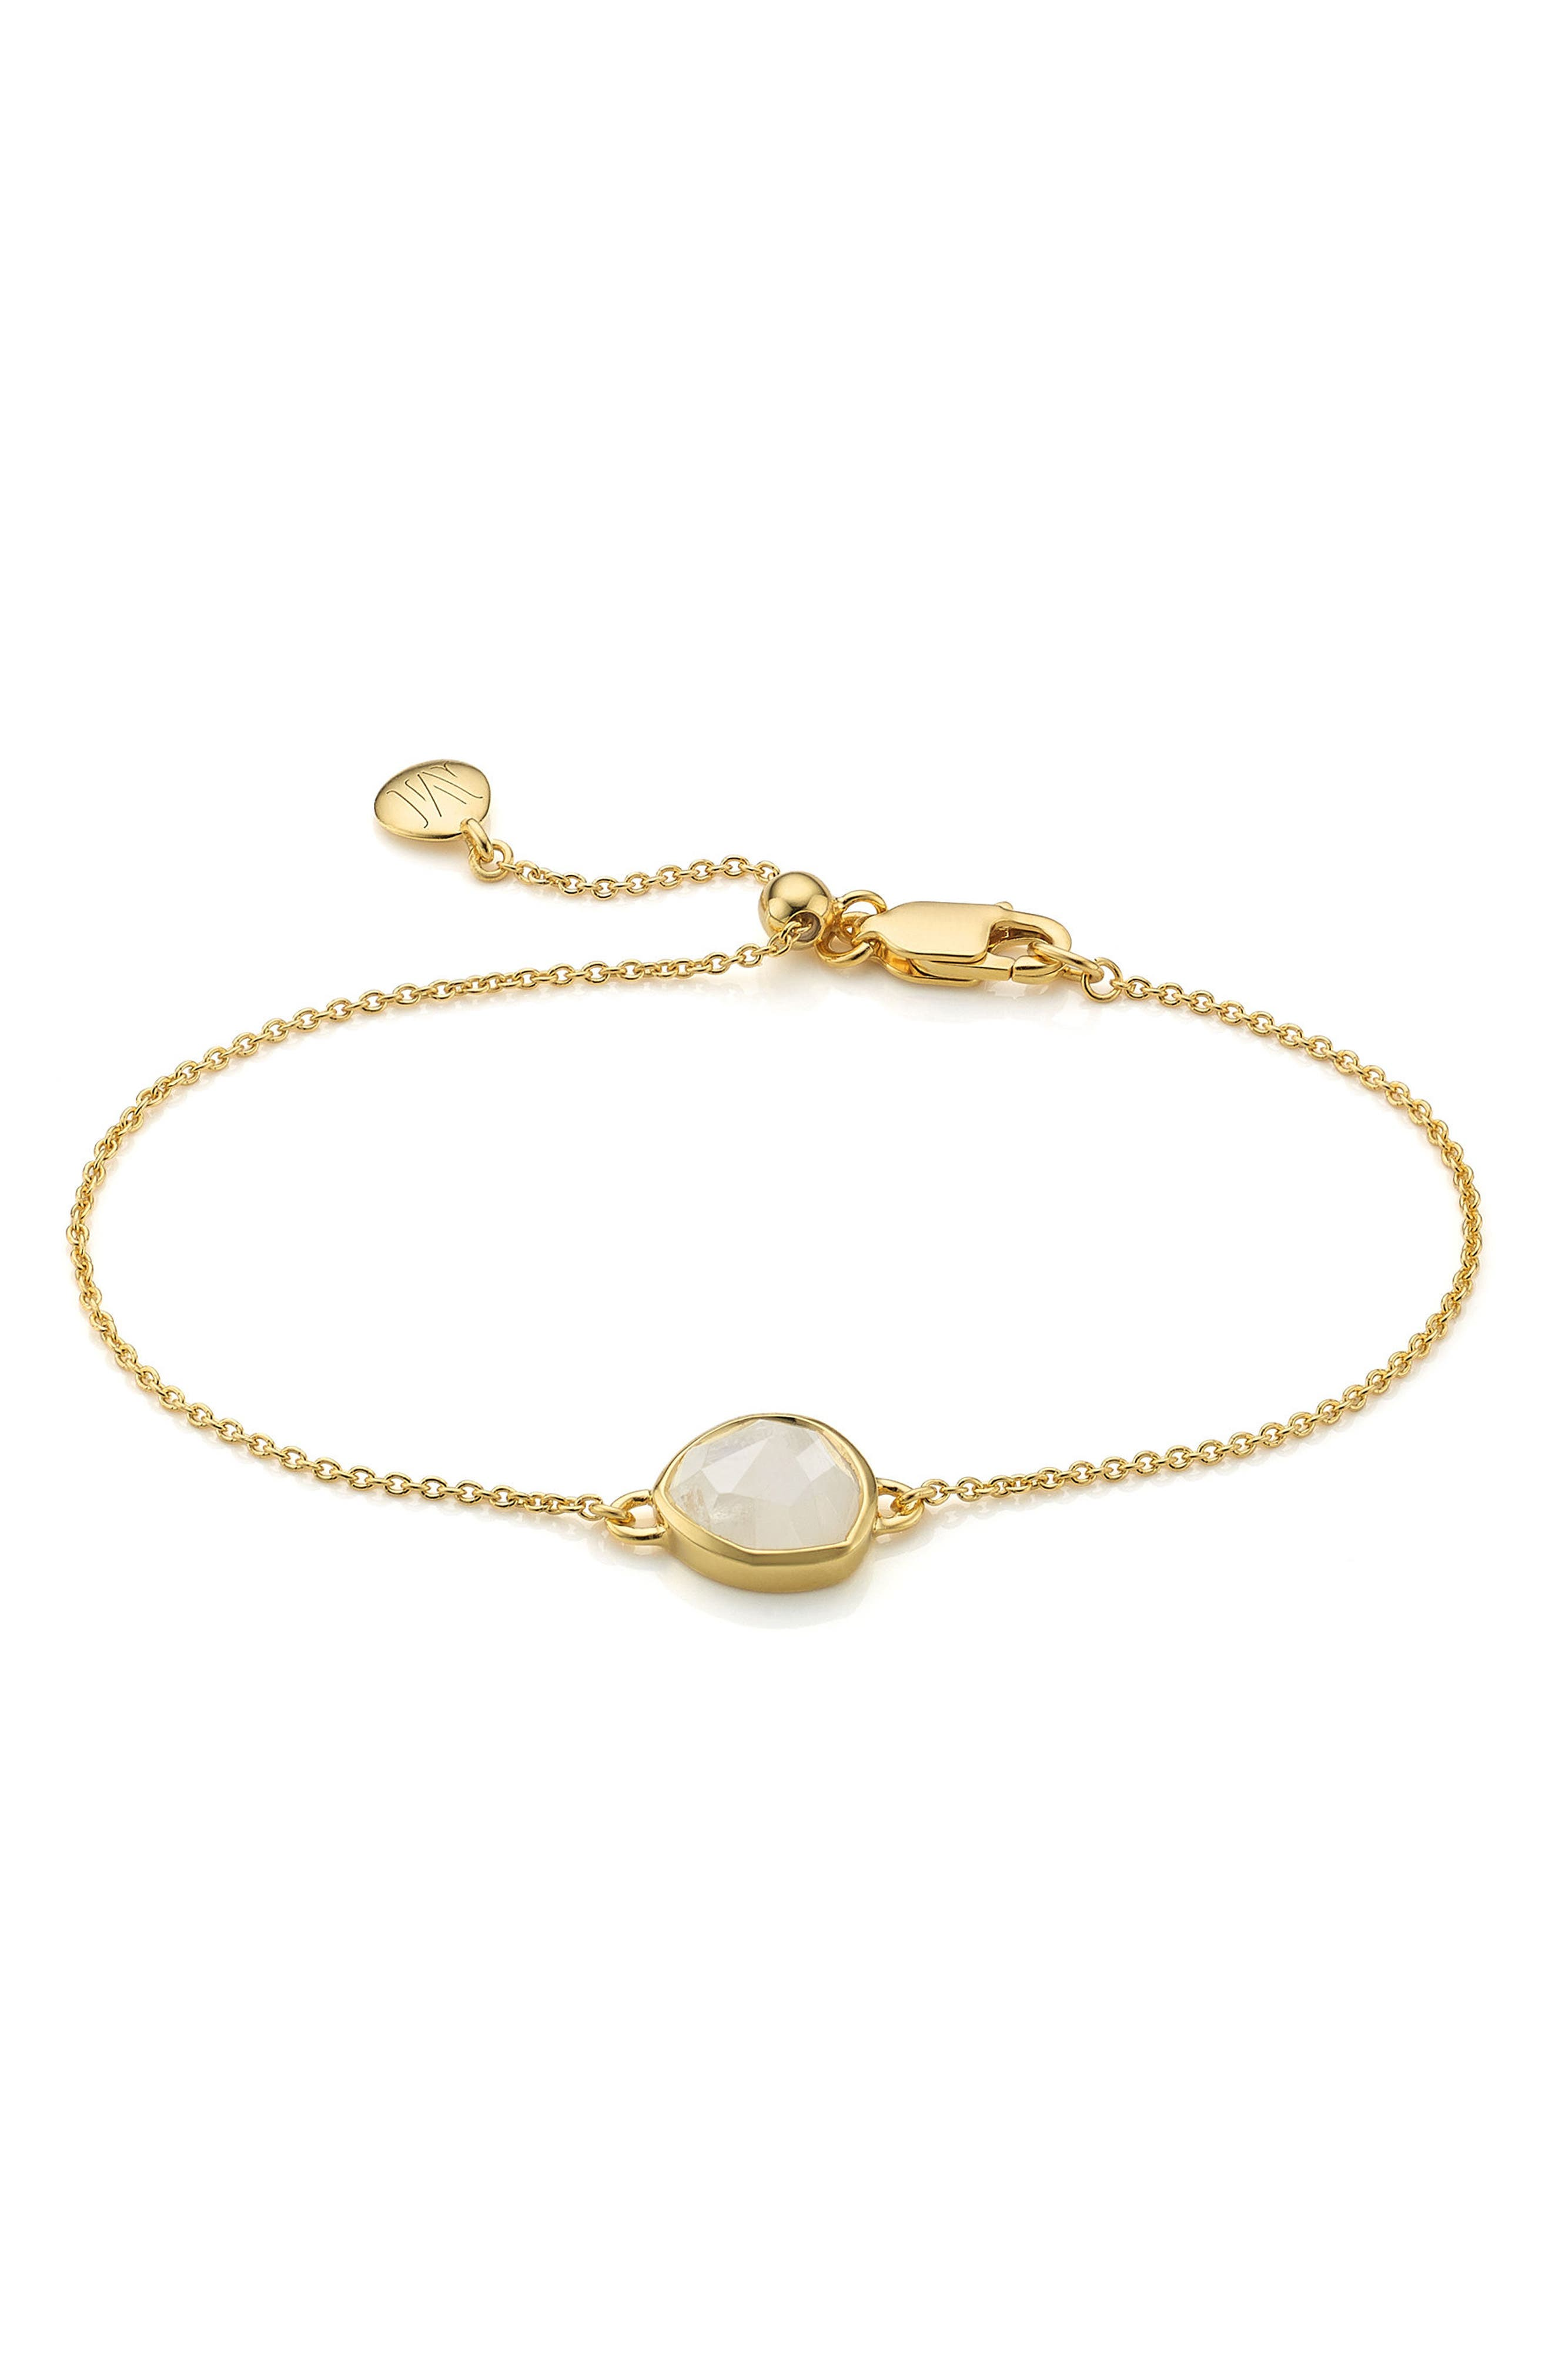 'Mini Siren' Fine Chain Bracelet,                             Main thumbnail 1, color,                             MOONSTONE/ YELLOW GOLD